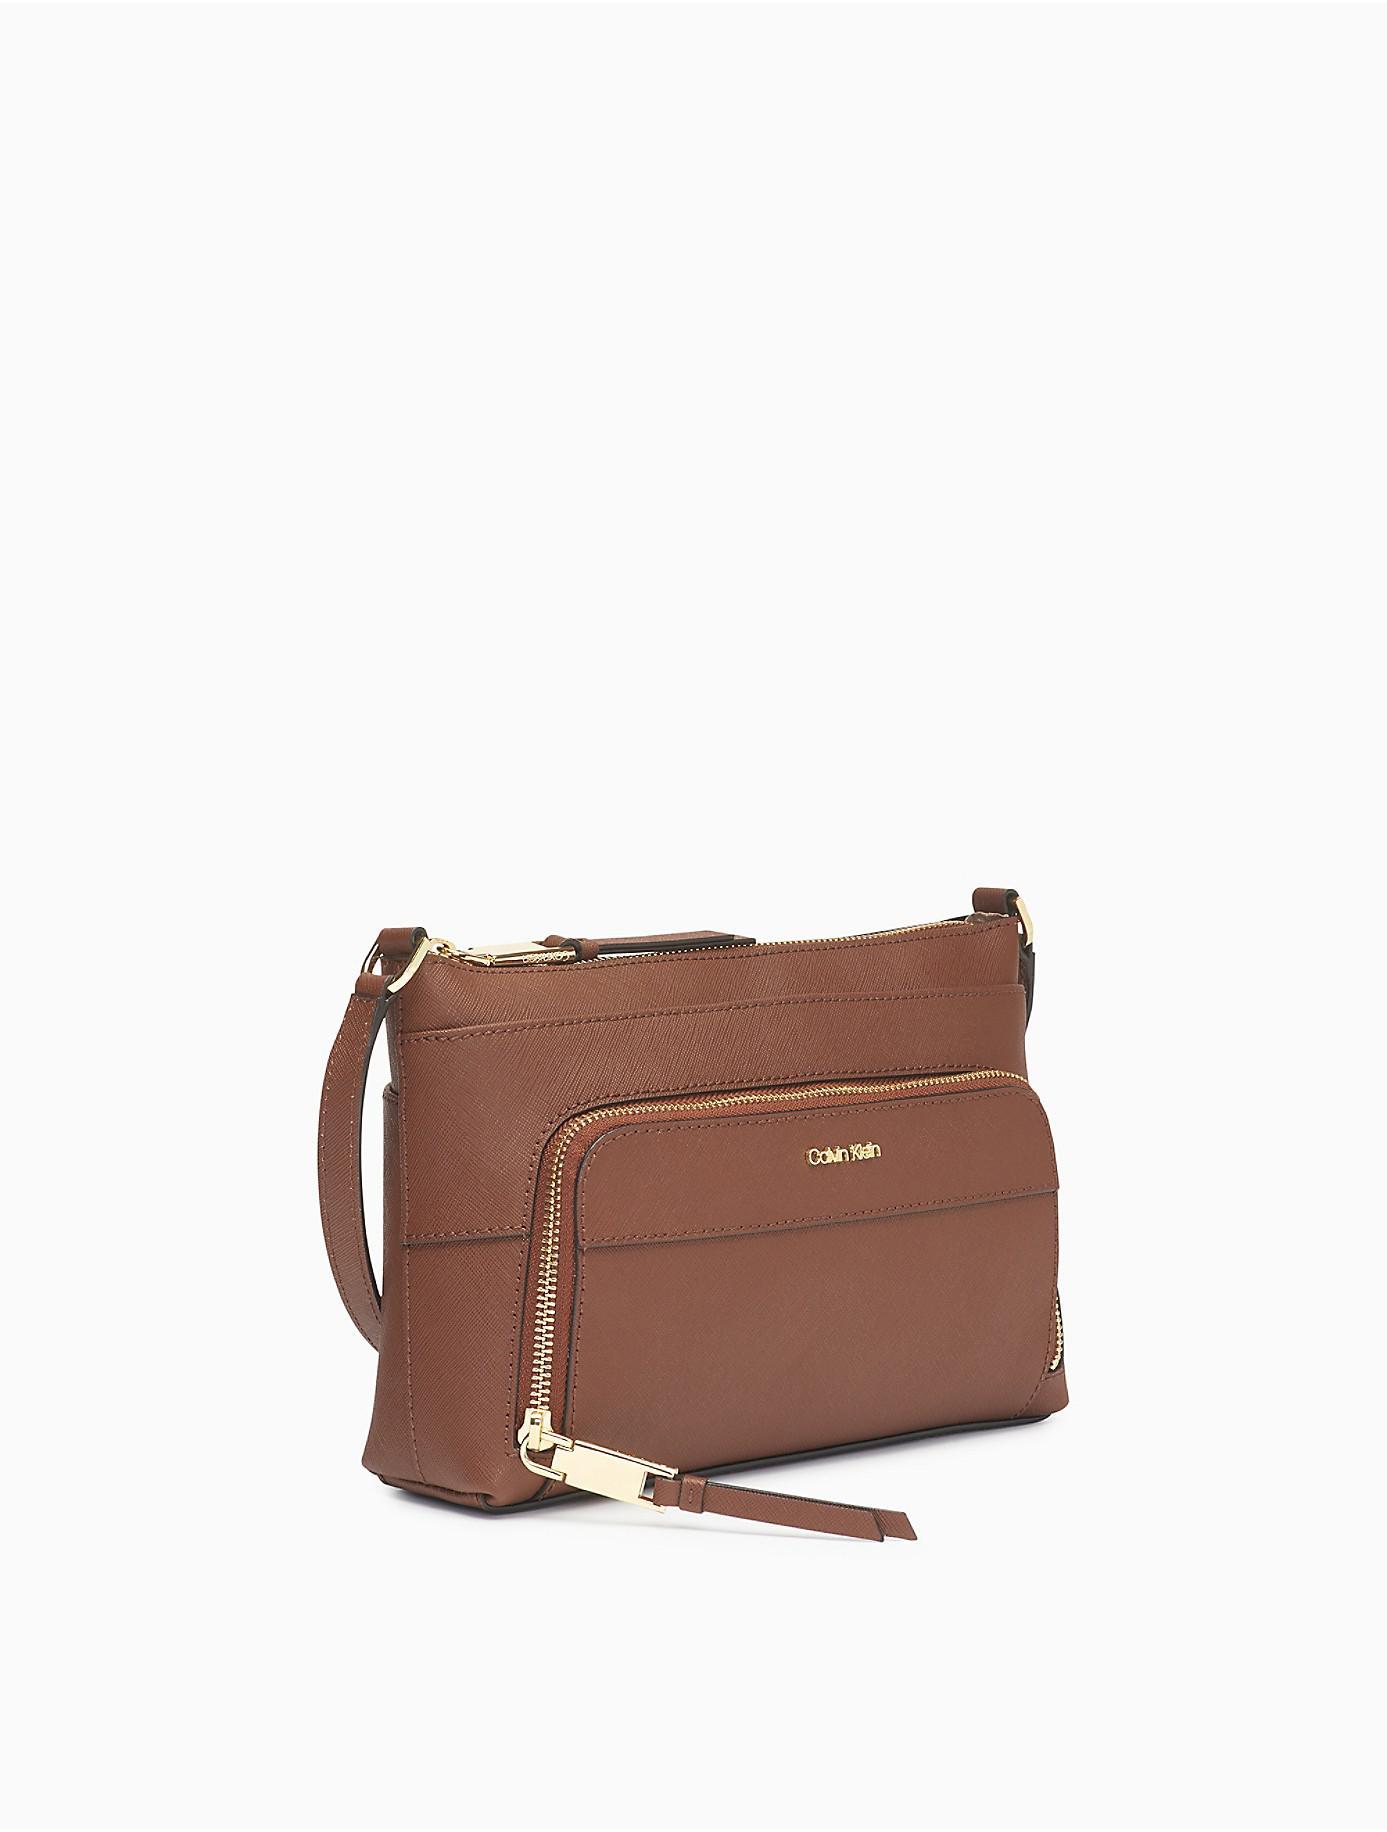 Lyst - Calvin Klein Saffiano Crossbody Bag in Brown d83b925675